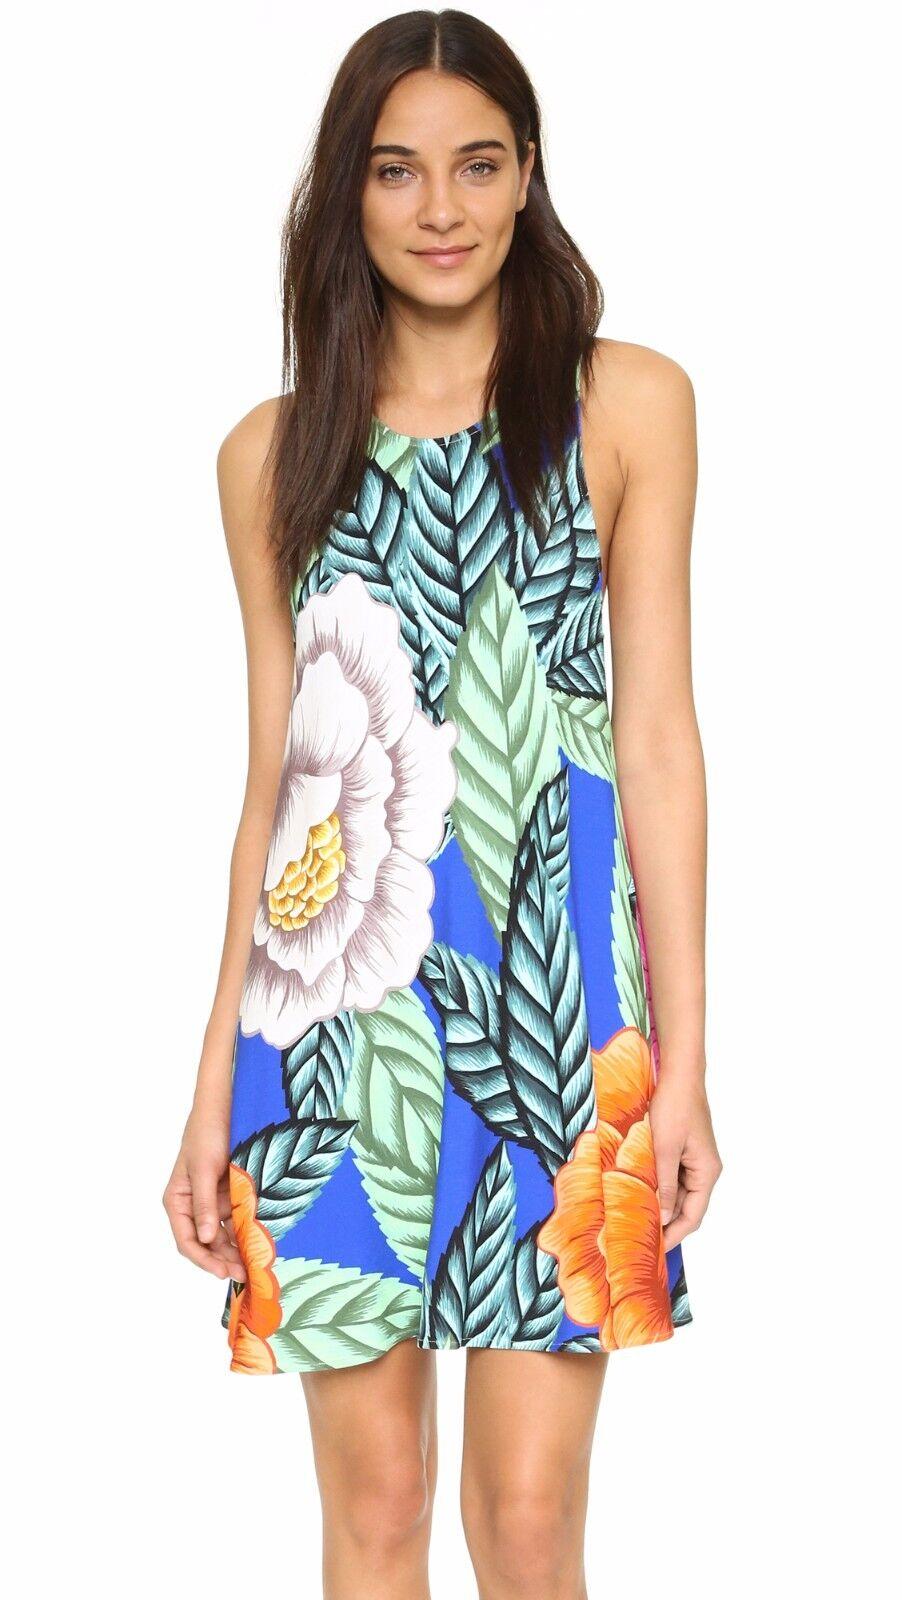 MARA HOFFMAN Floral Swing Dress Size XS NWT  268